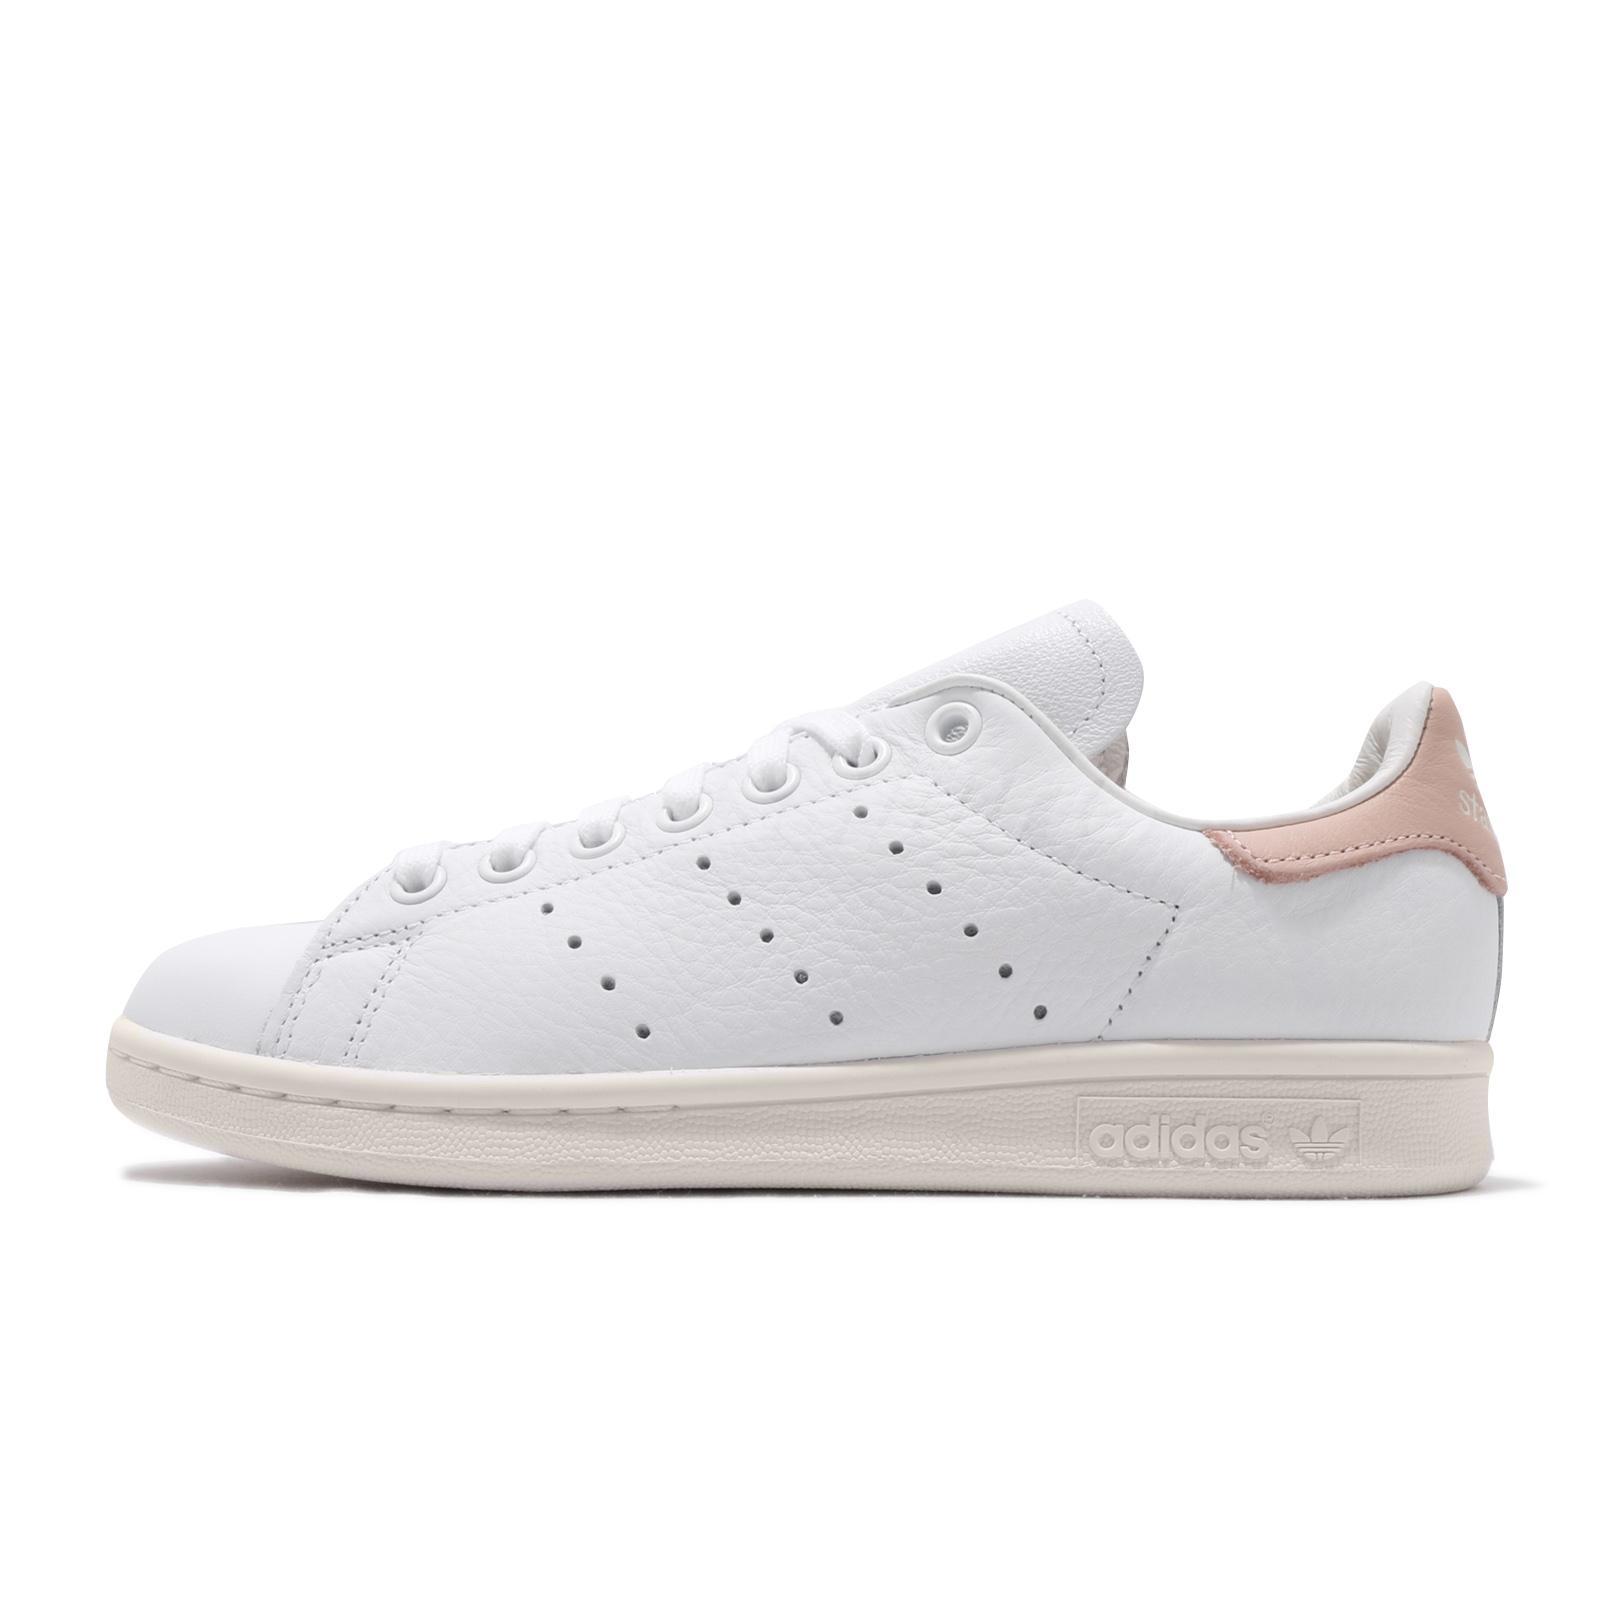 Adidas Stan Smith Cloud White Vapour Pink Off White